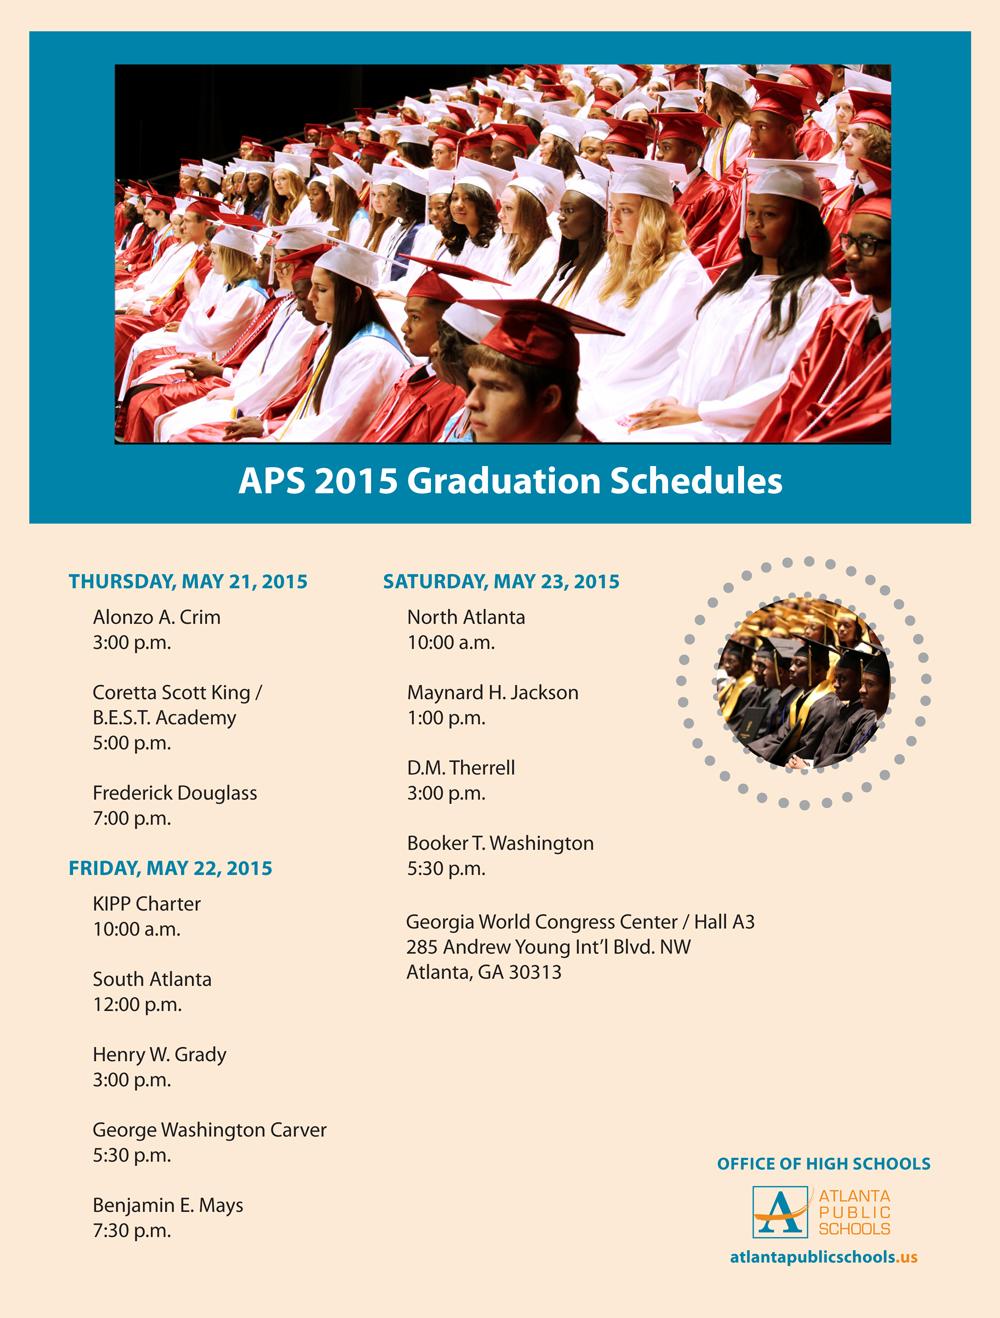 2015-APS-graduation-schedules